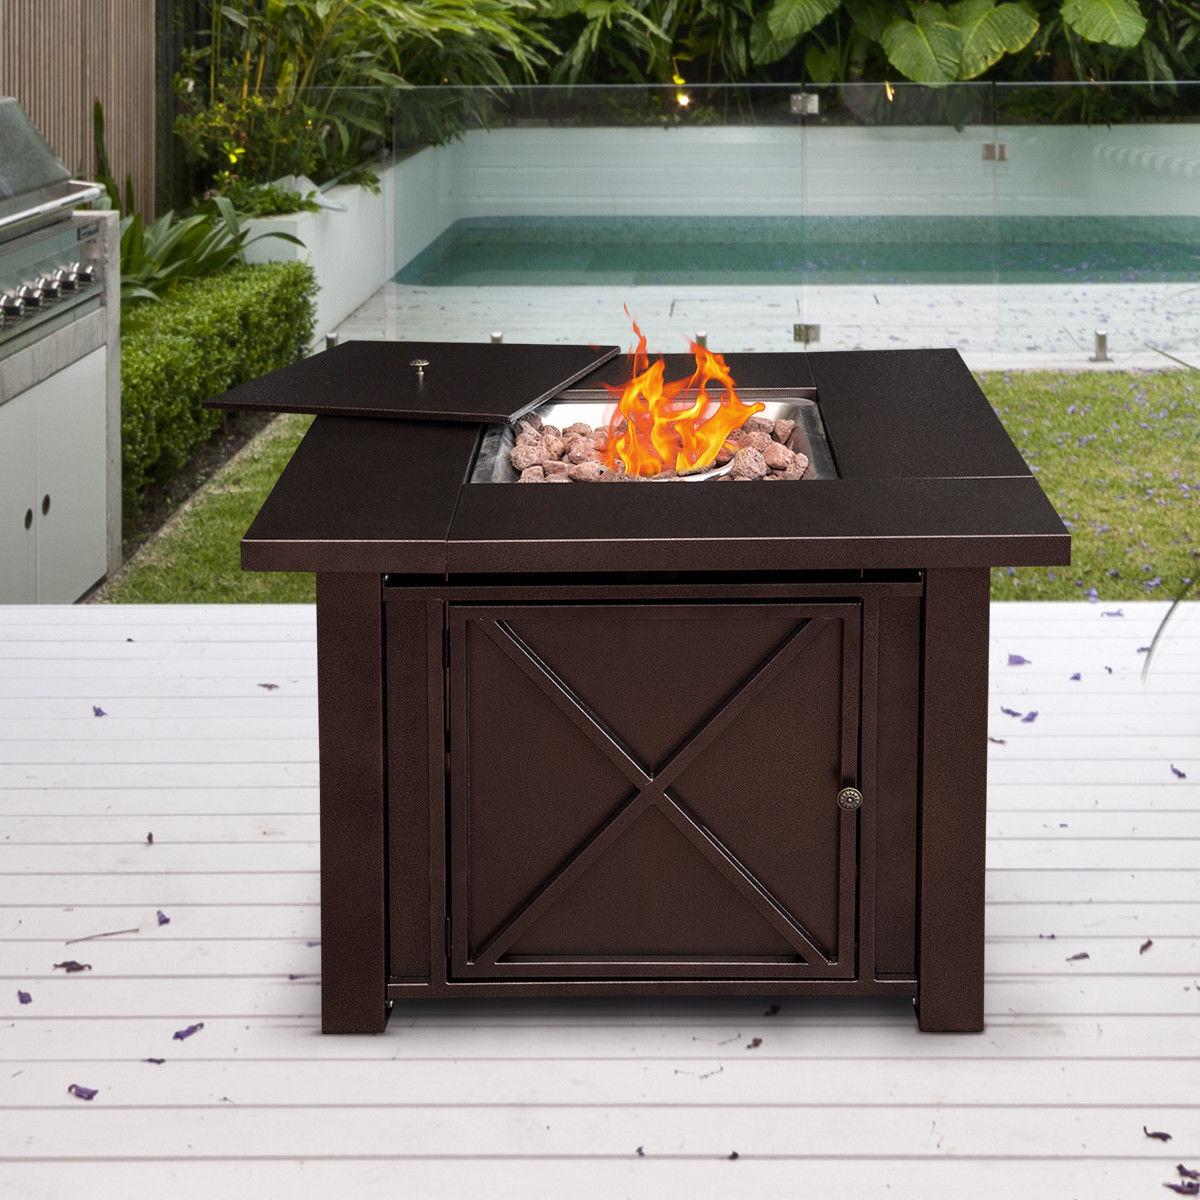 "Costway 38"" Square Patio Heater Propane Gas Fire Pit Table 40000 BTUs Outdoor - image 9 de 10"